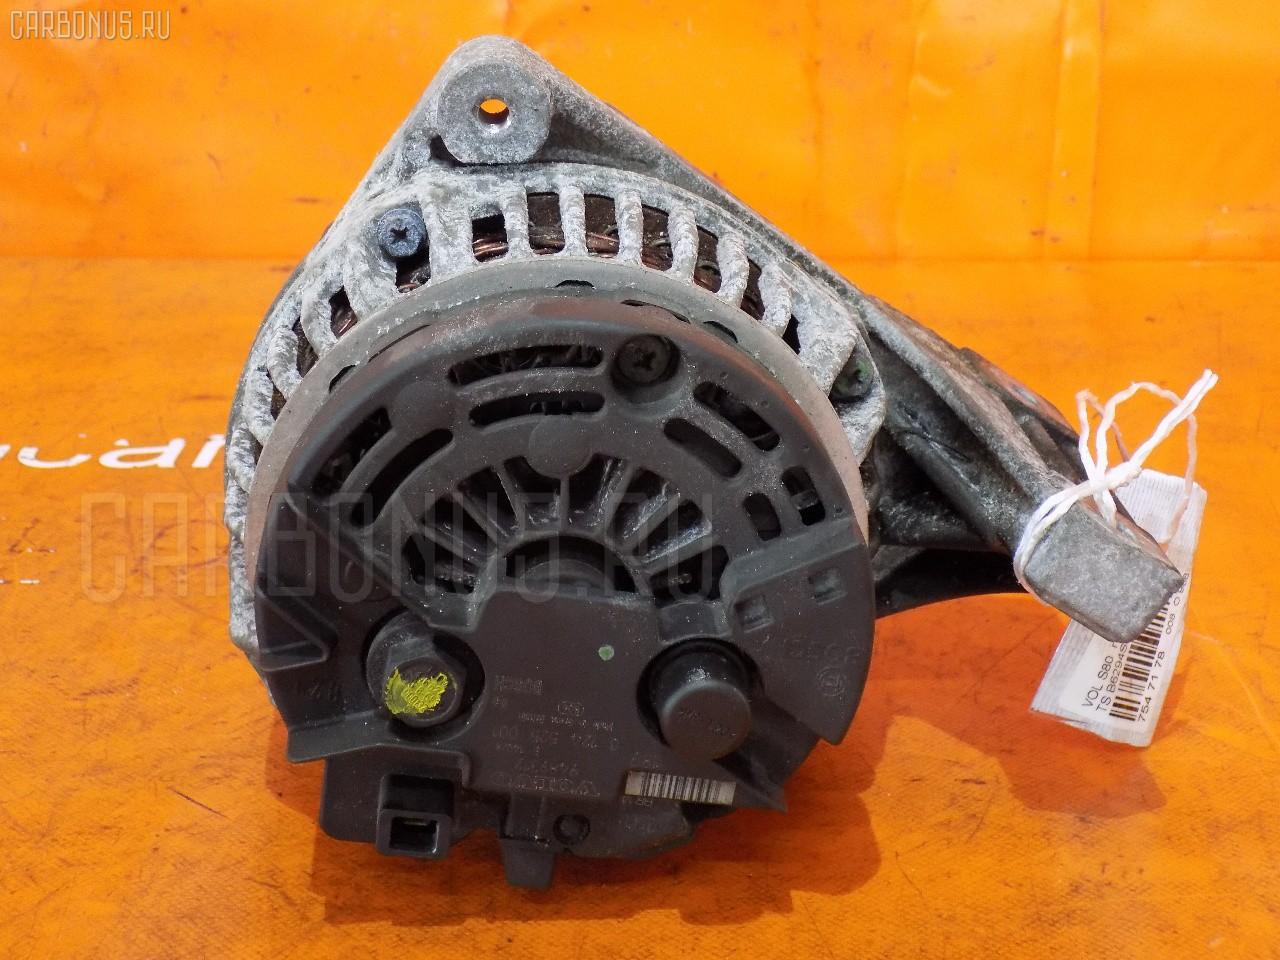 Генератор YV1TS92K521247055 36050264 на Volvo S80 I TS B6294S2 Фото 1